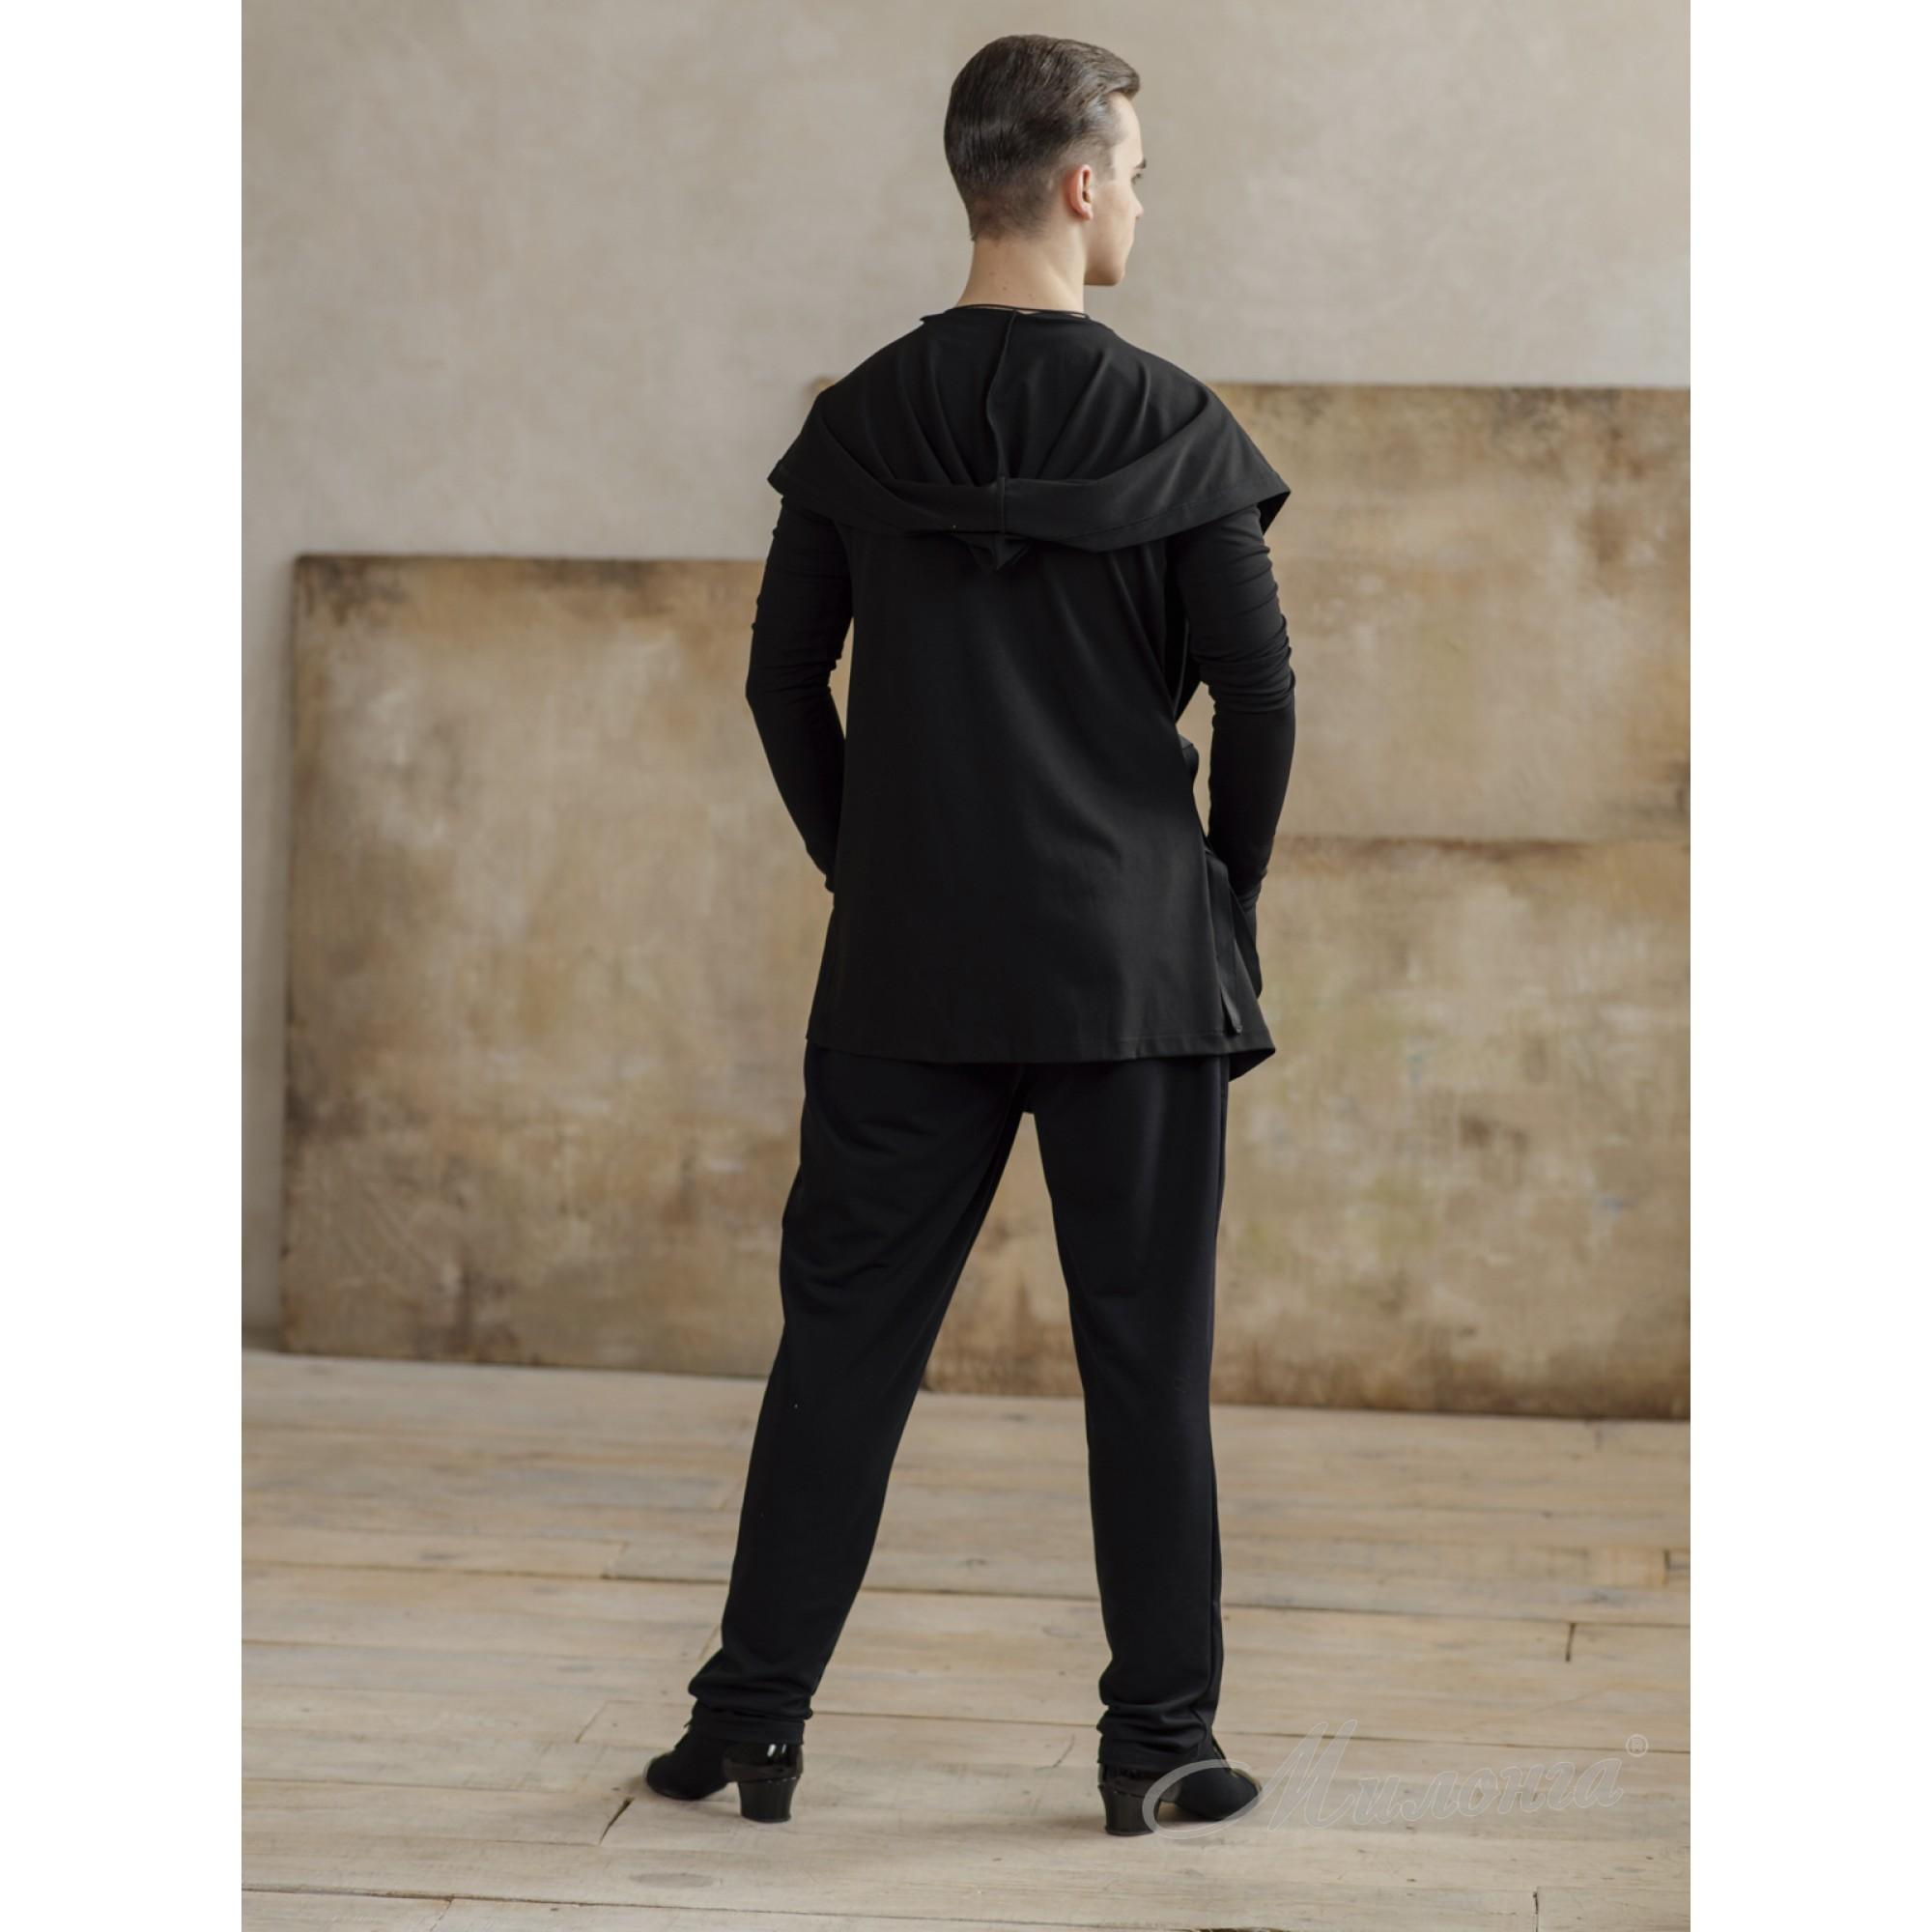 Мужской кардиган с капюшоном Stesh coat01